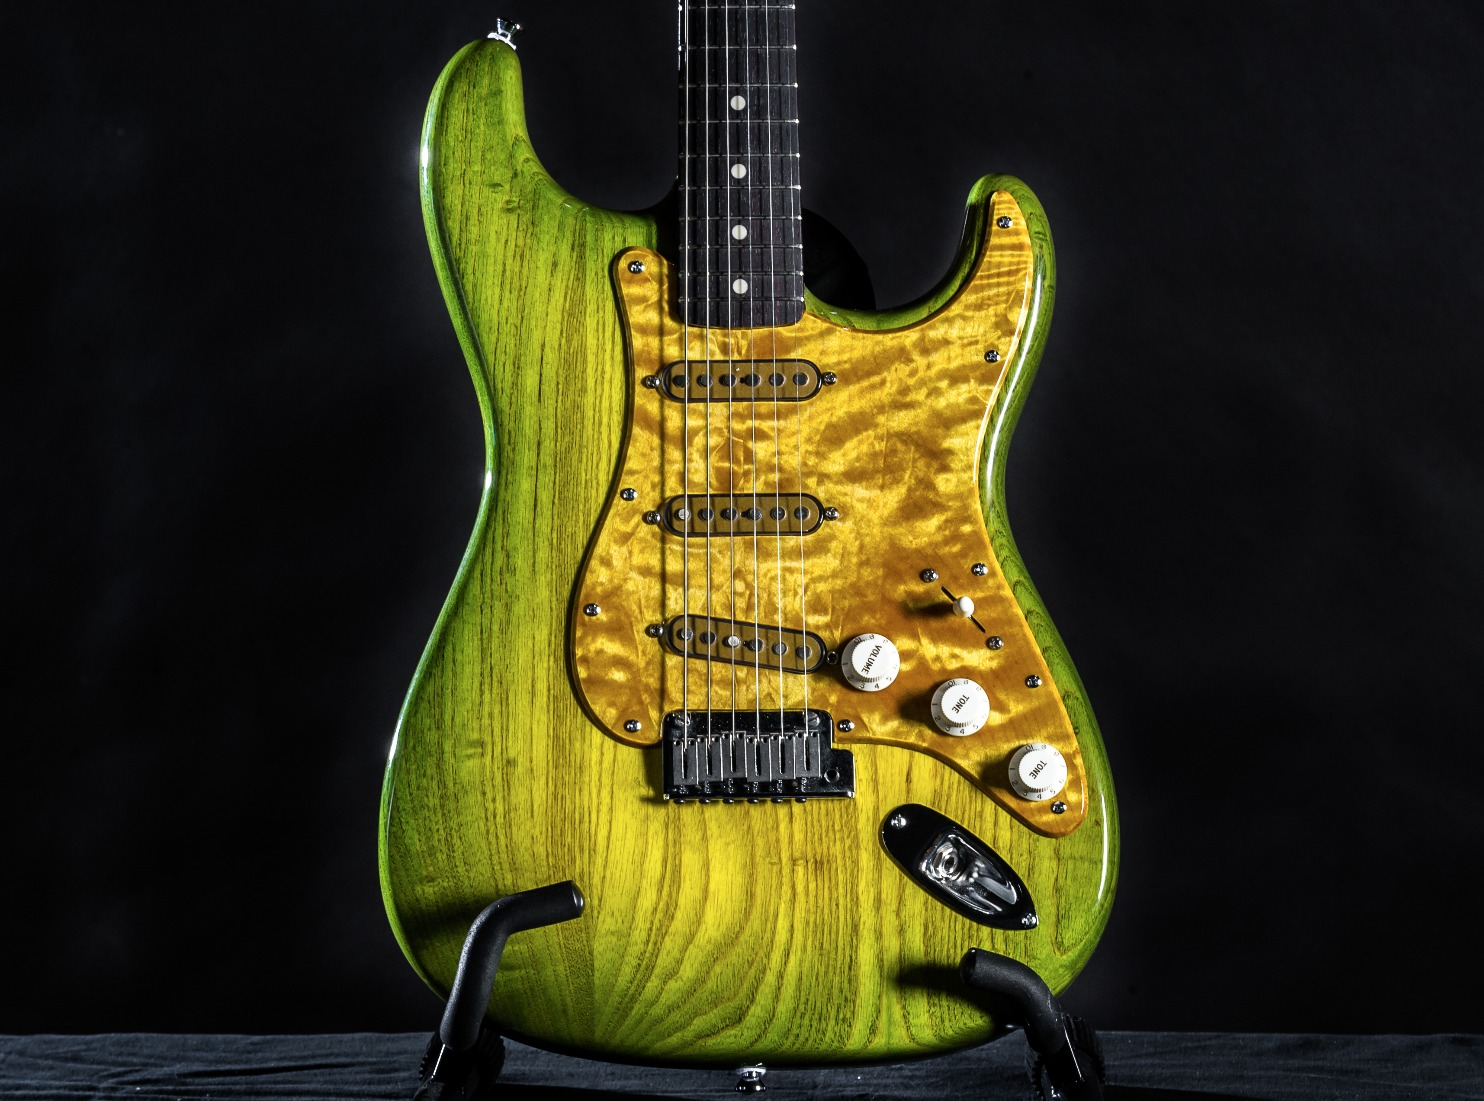 GuitarSpa-Memphis-002-DSC_7830_edited